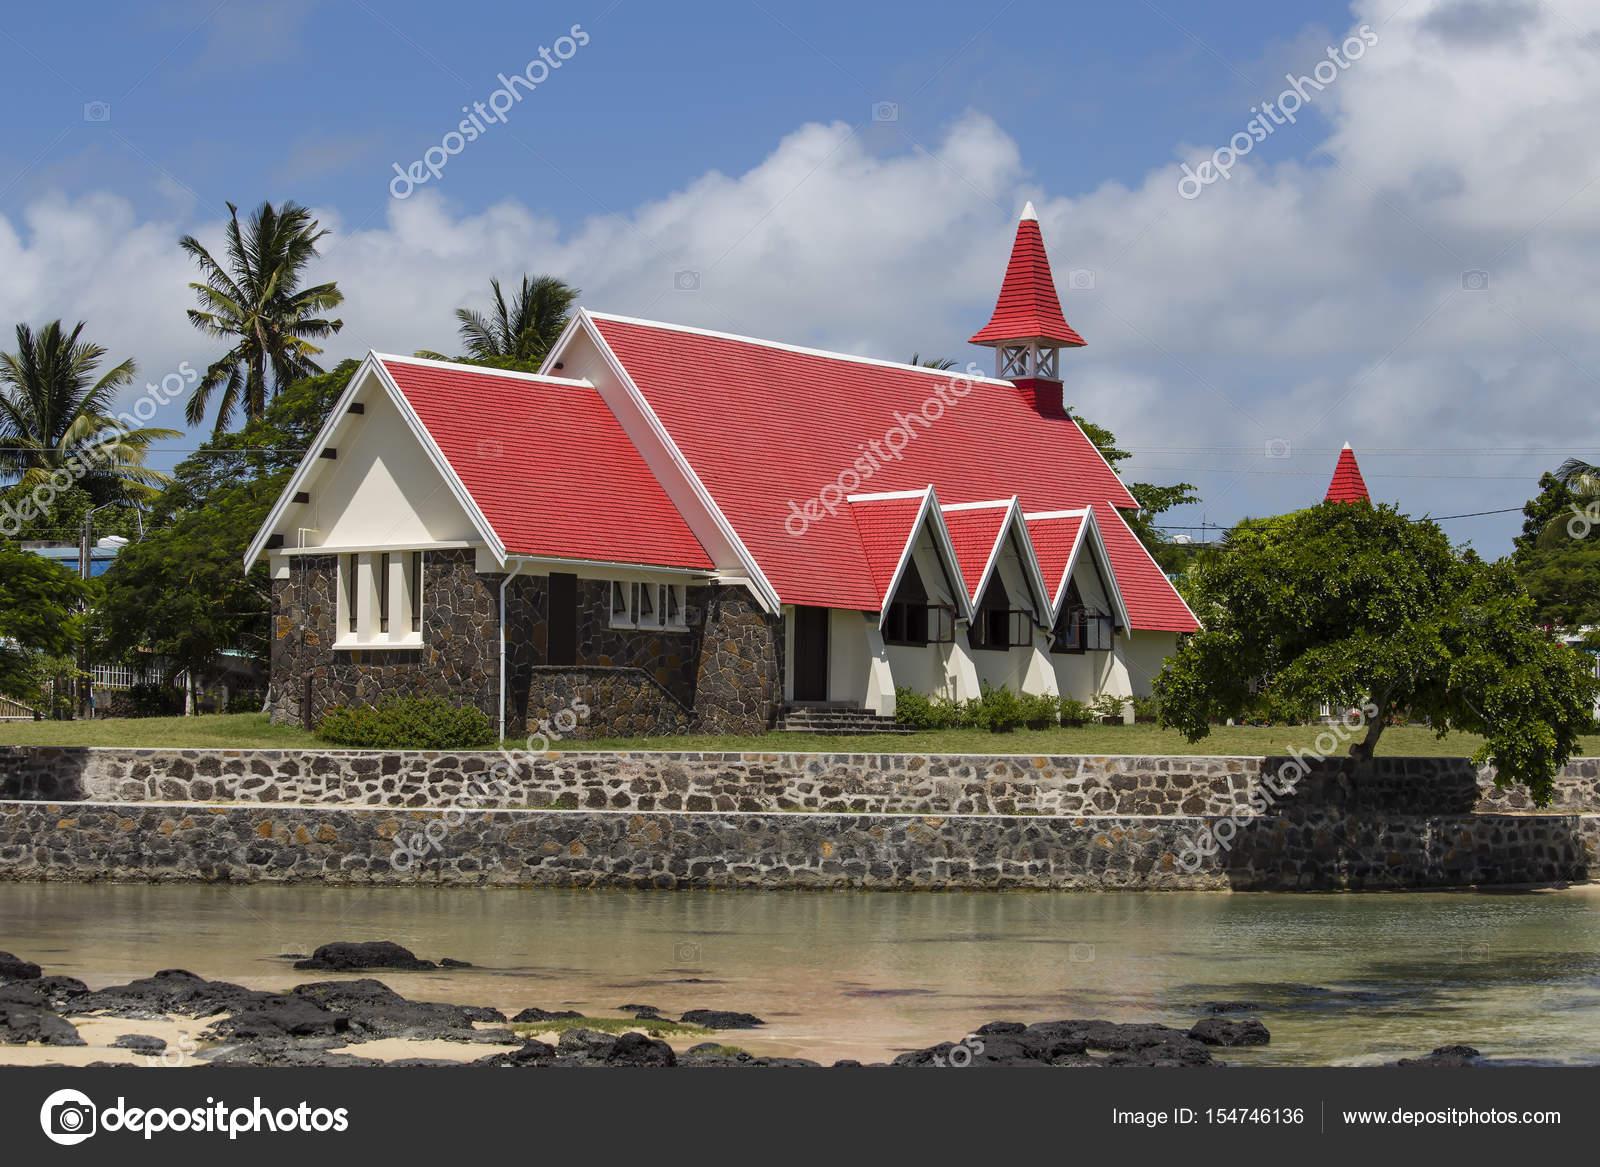 Landmarks of Mauritius island - Red church on the beach  Cap